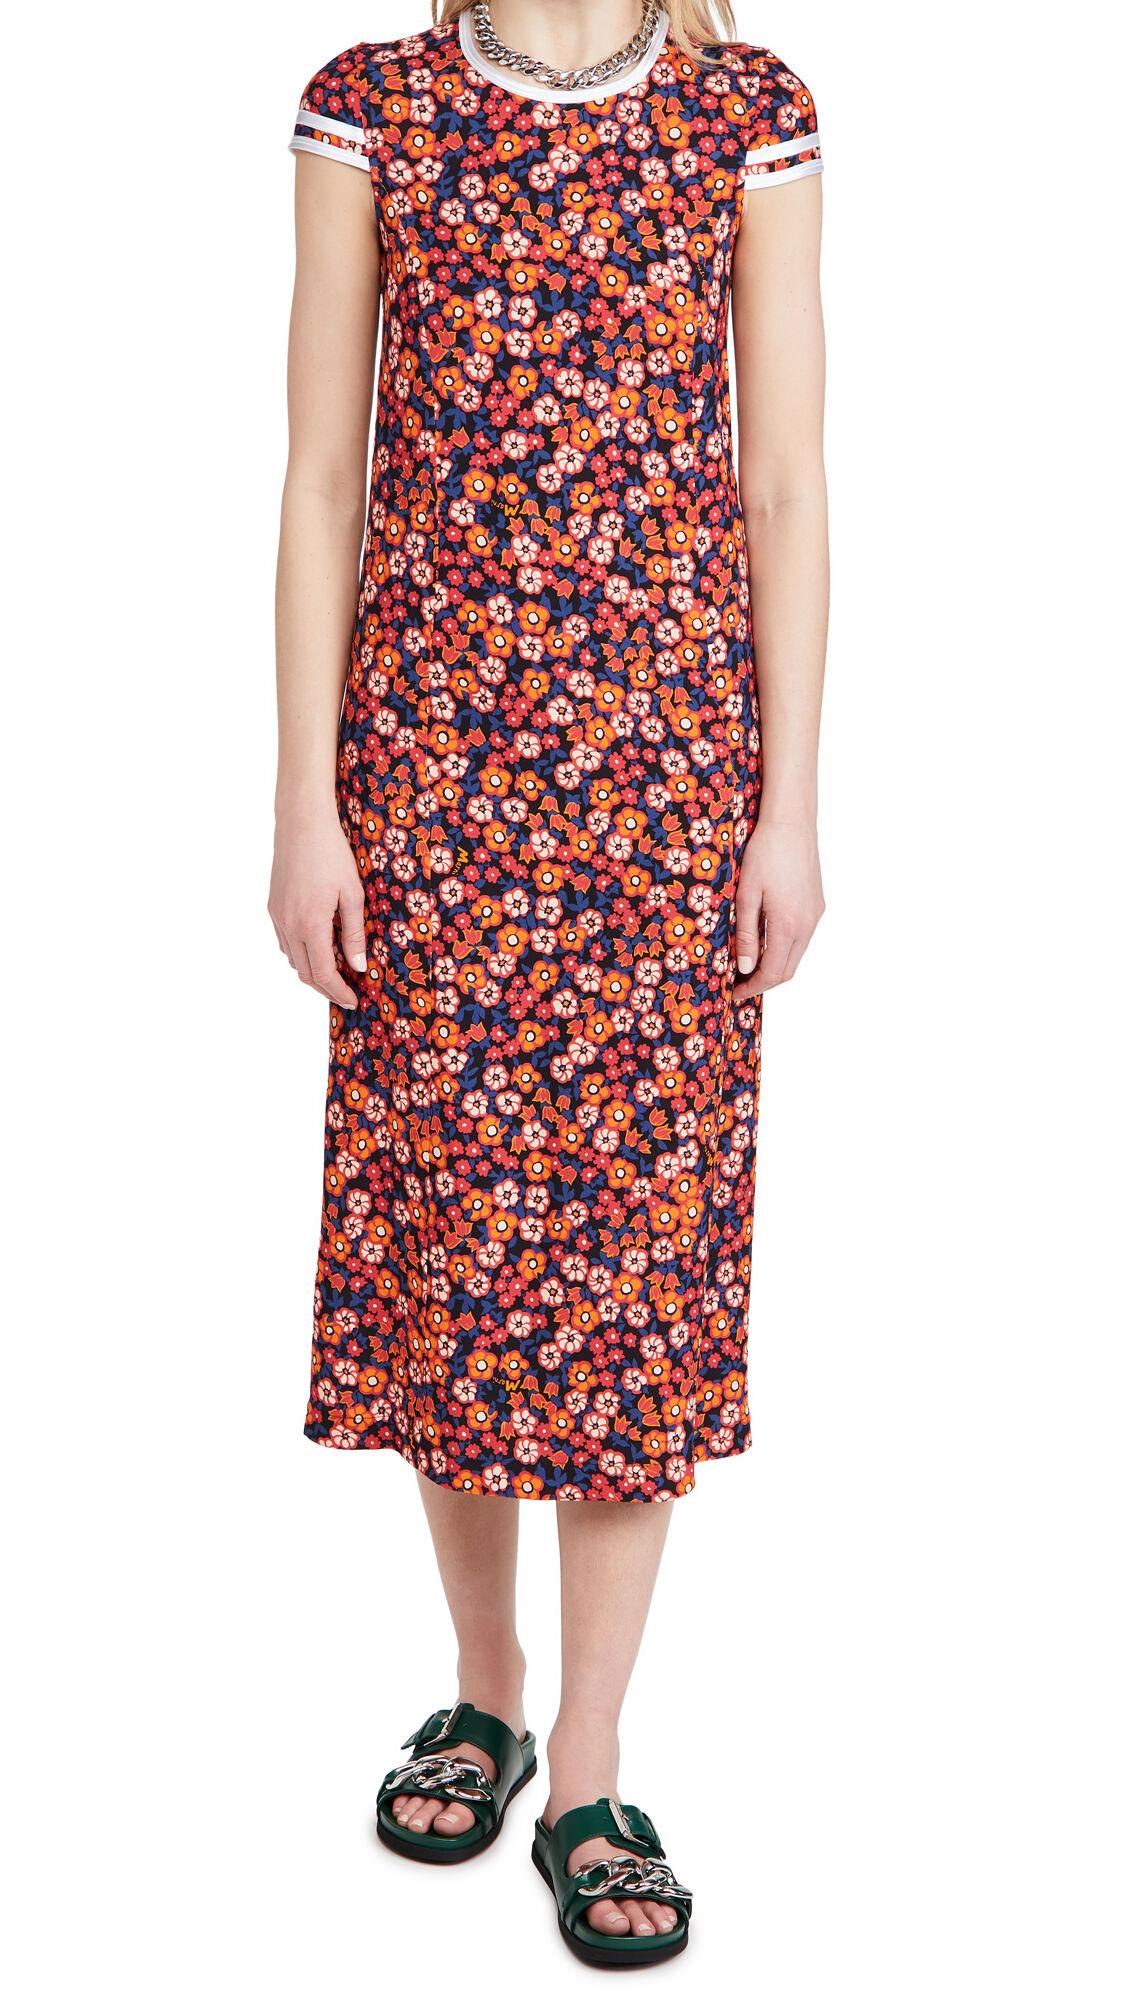 Marni Short Sleeve Dress  - Pop Garden Print - Size: 38